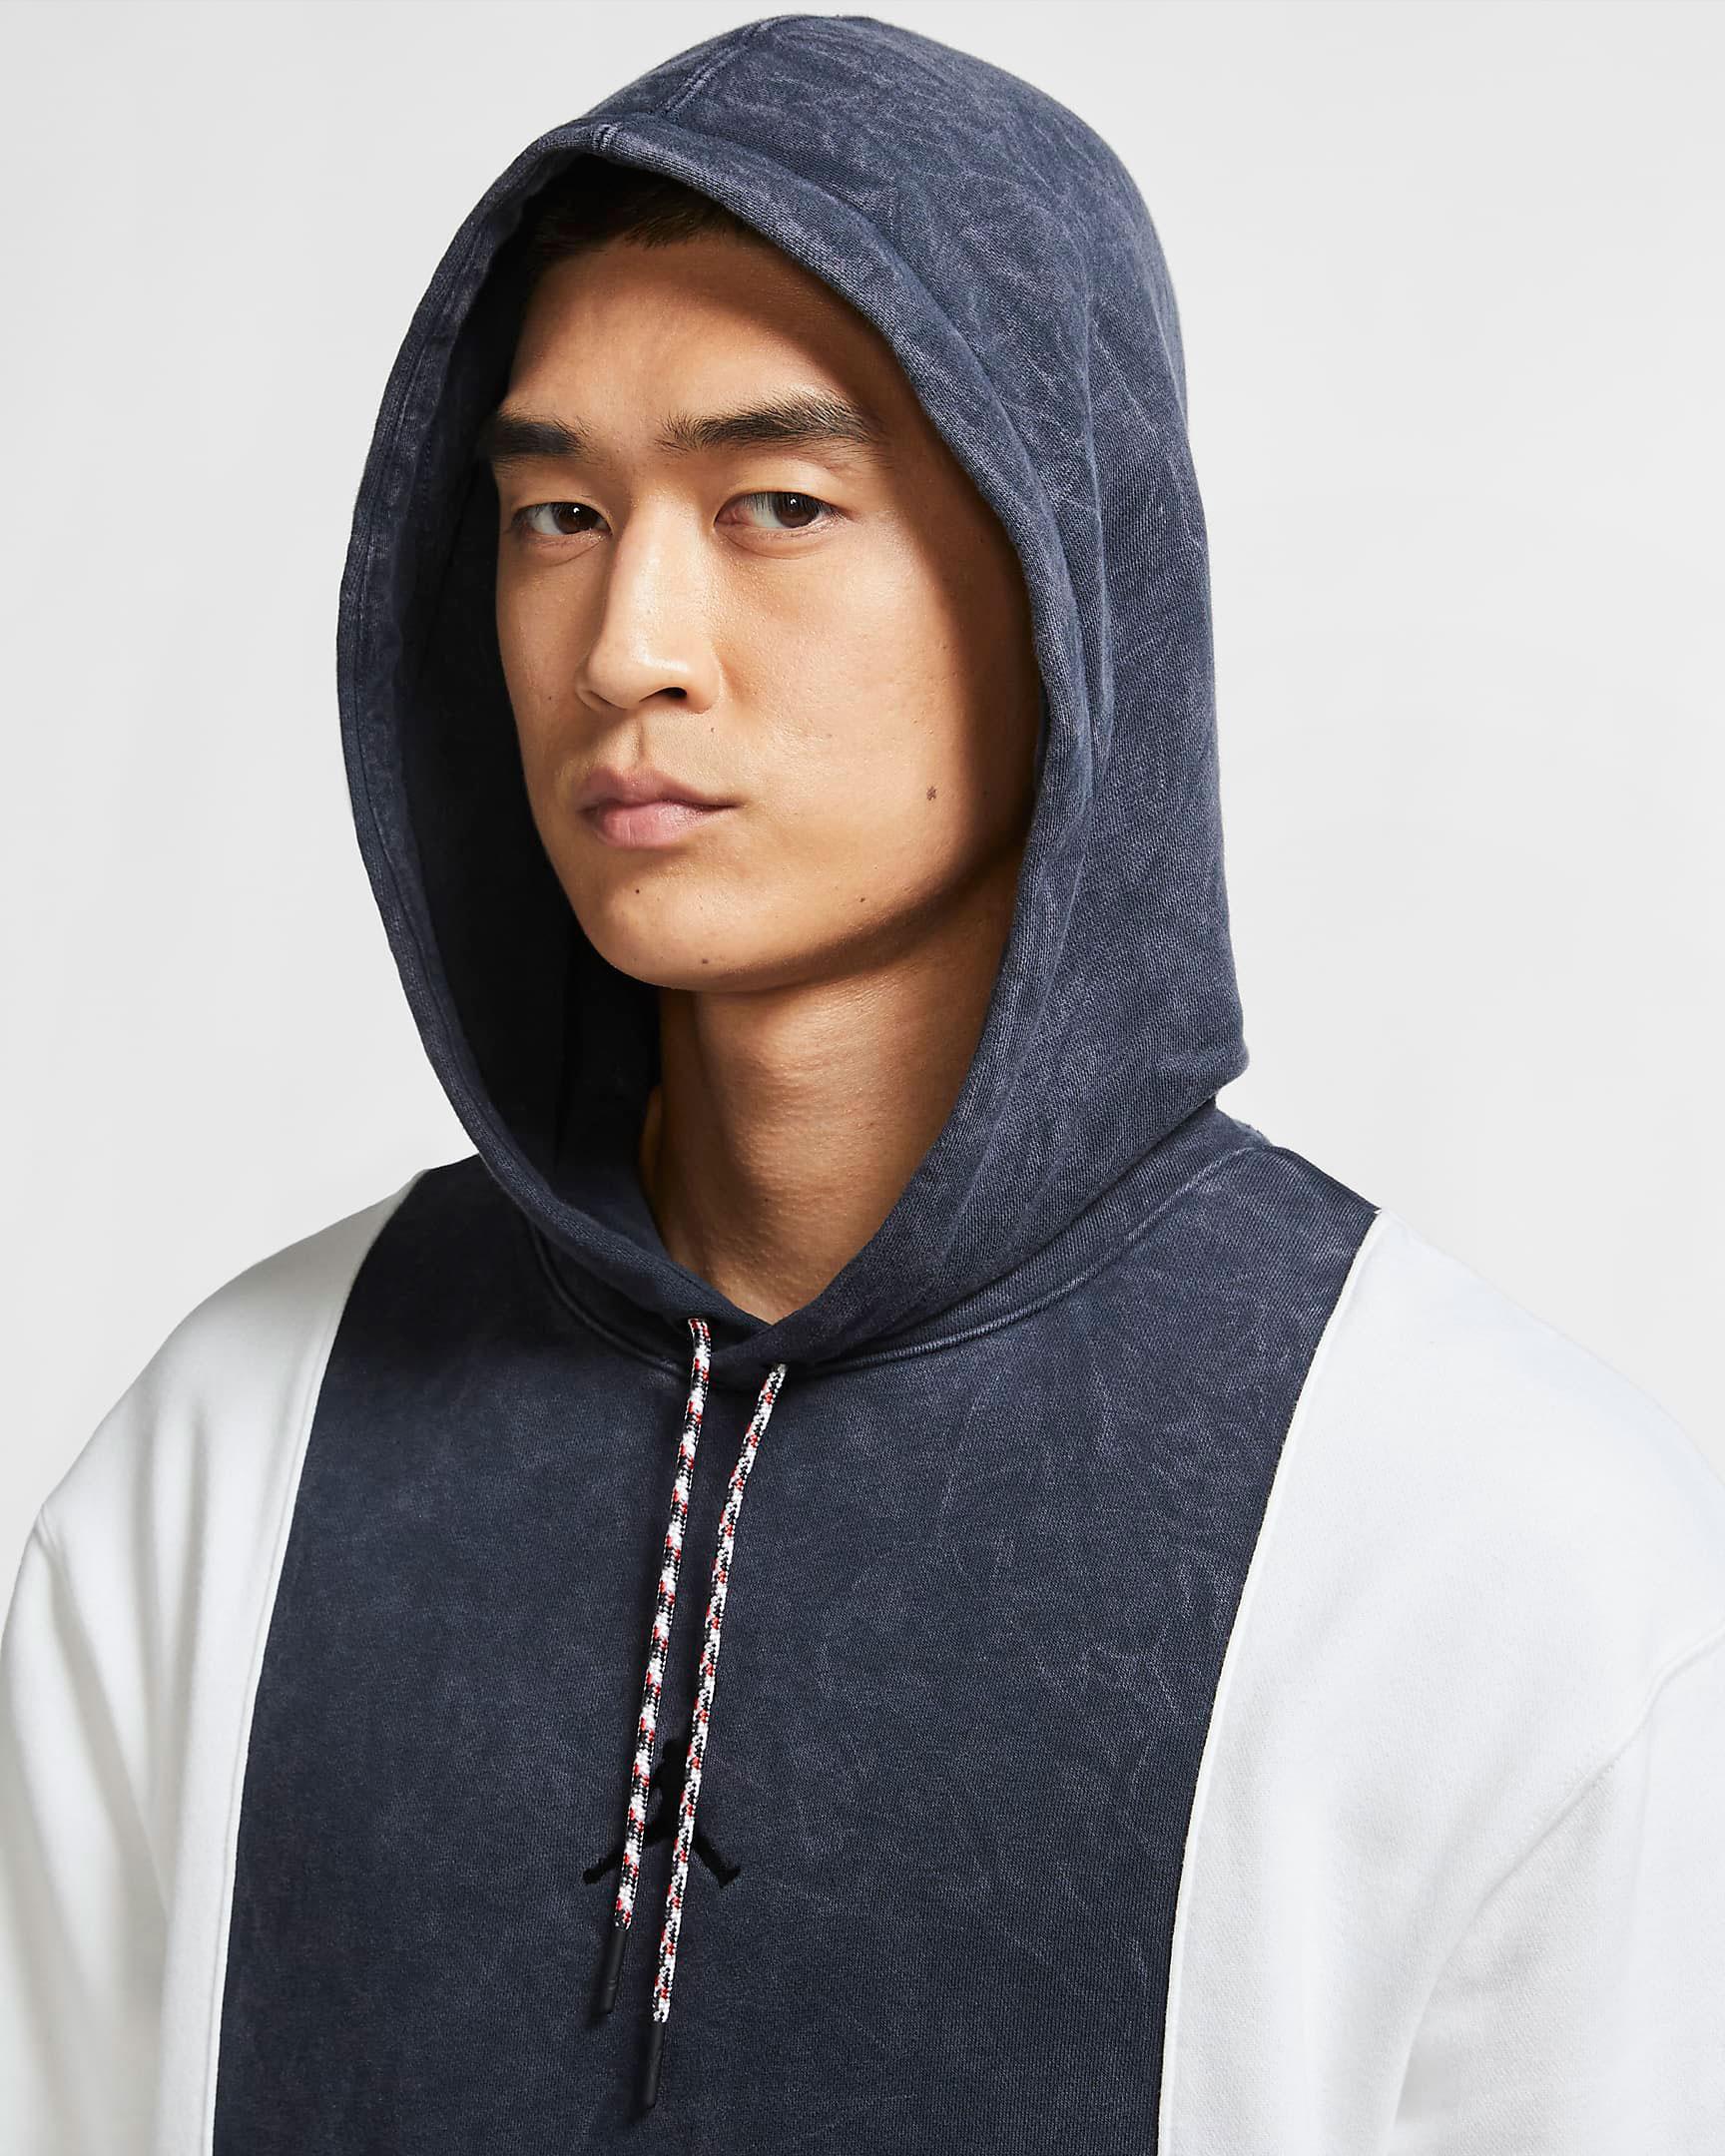 air-jordan-3-denim-fire-red-japan-matching-hoodie-1